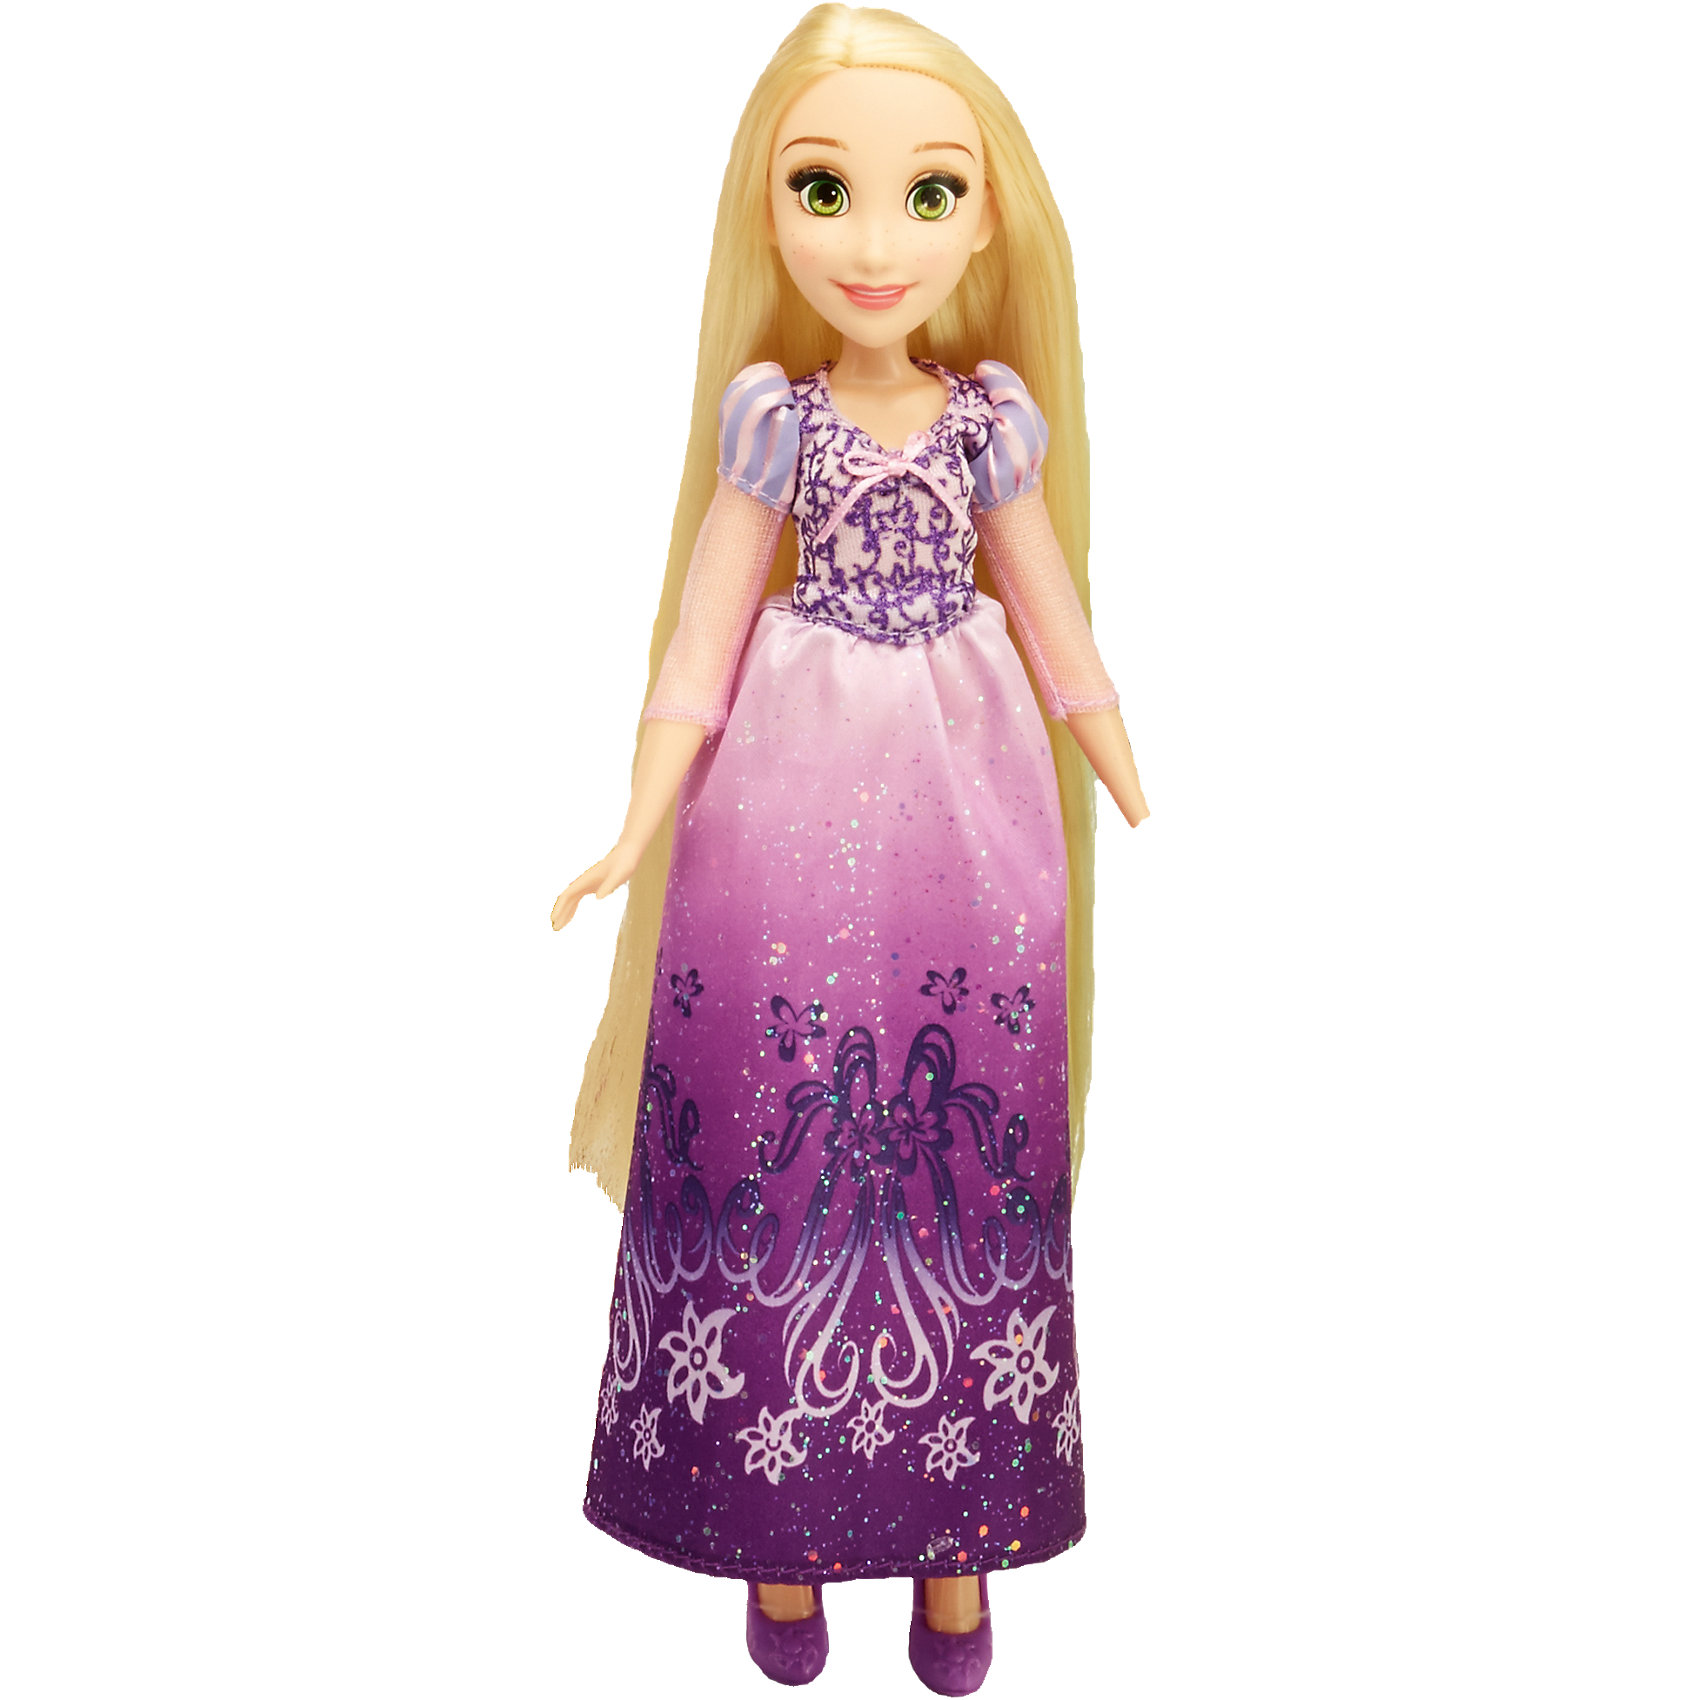 Hasbro Кукла Рапунцель, Принцессы Дисней кукла золушка 7 5 см принцессы дисней